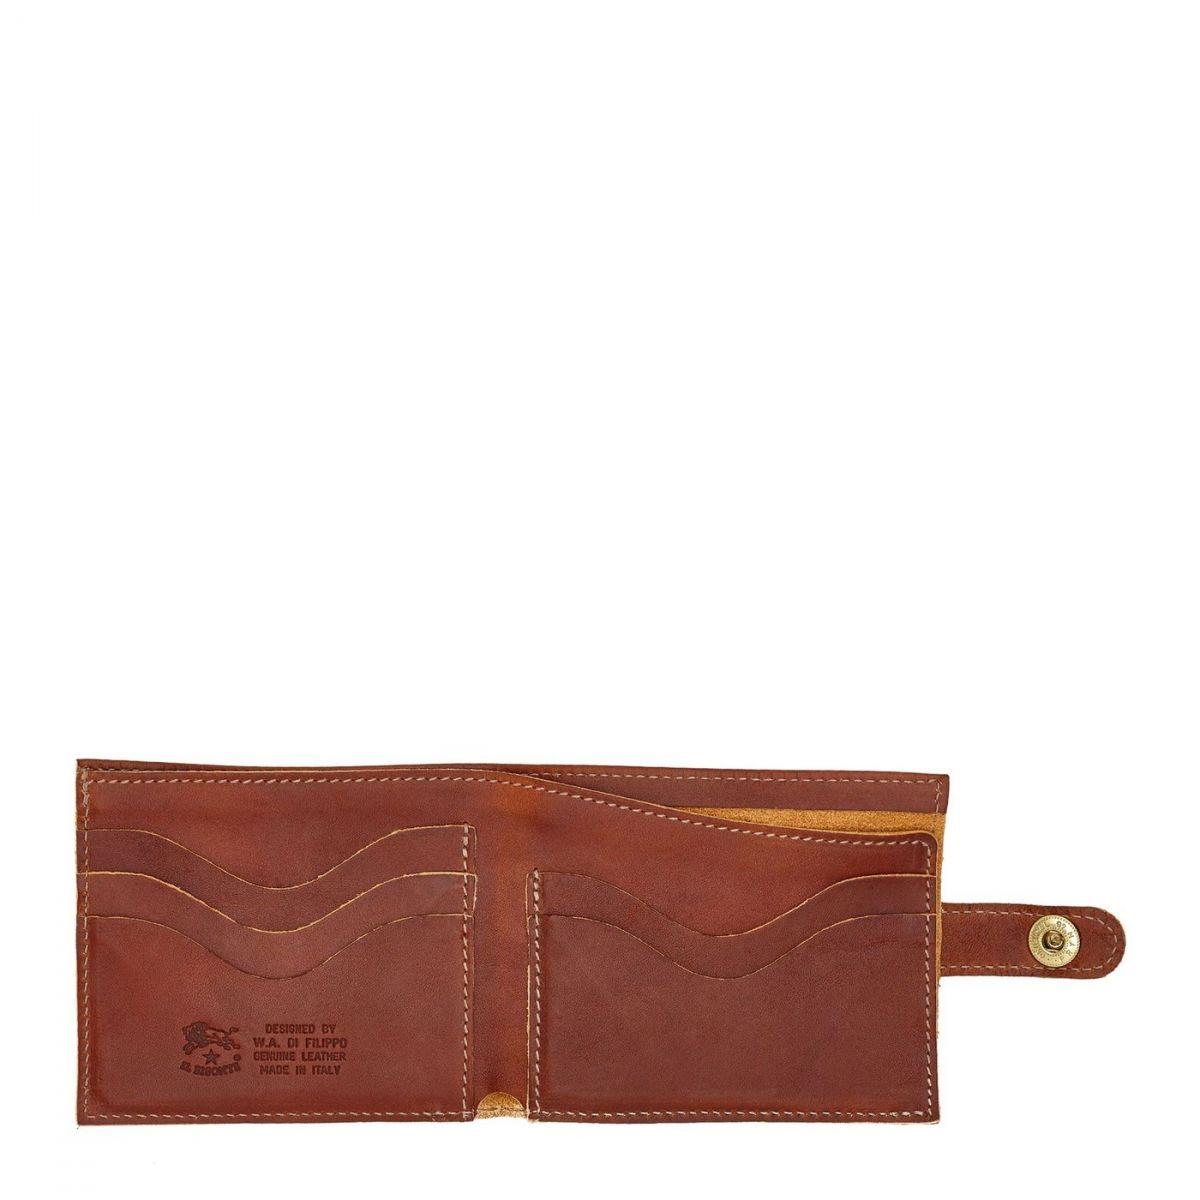 Men's Bi-Fold Wallet in Vintage Cowhide Leather SBW034 color Dark Brown Seppia | Details